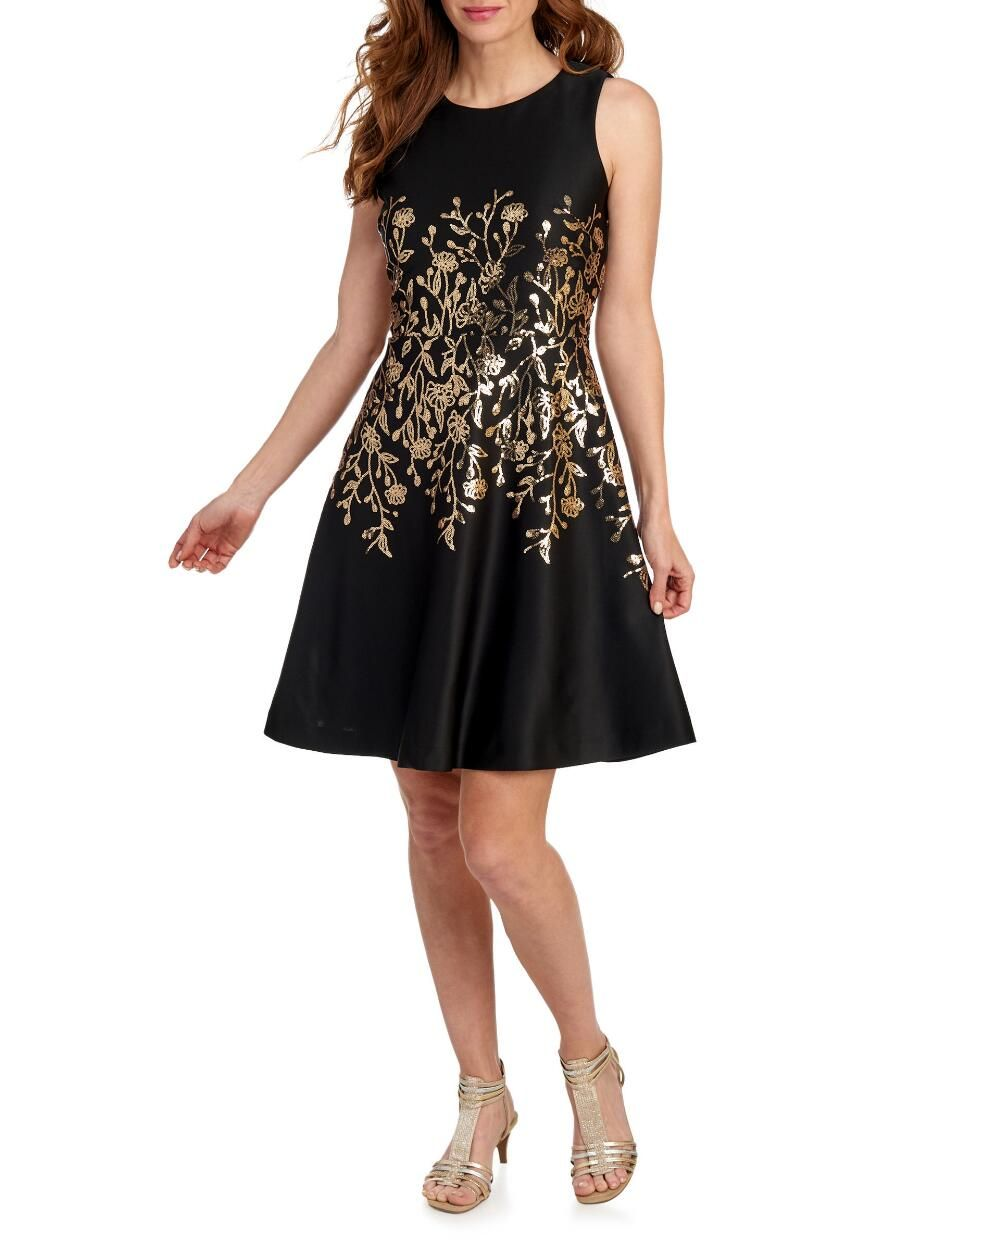 Sequin Vine Fit Flare Dress Evening Formal Shop By Occasion Dresses Stein Mart Flare Dress Fit Flare Dress Dresses [ 1250 x 1000 Pixel ]